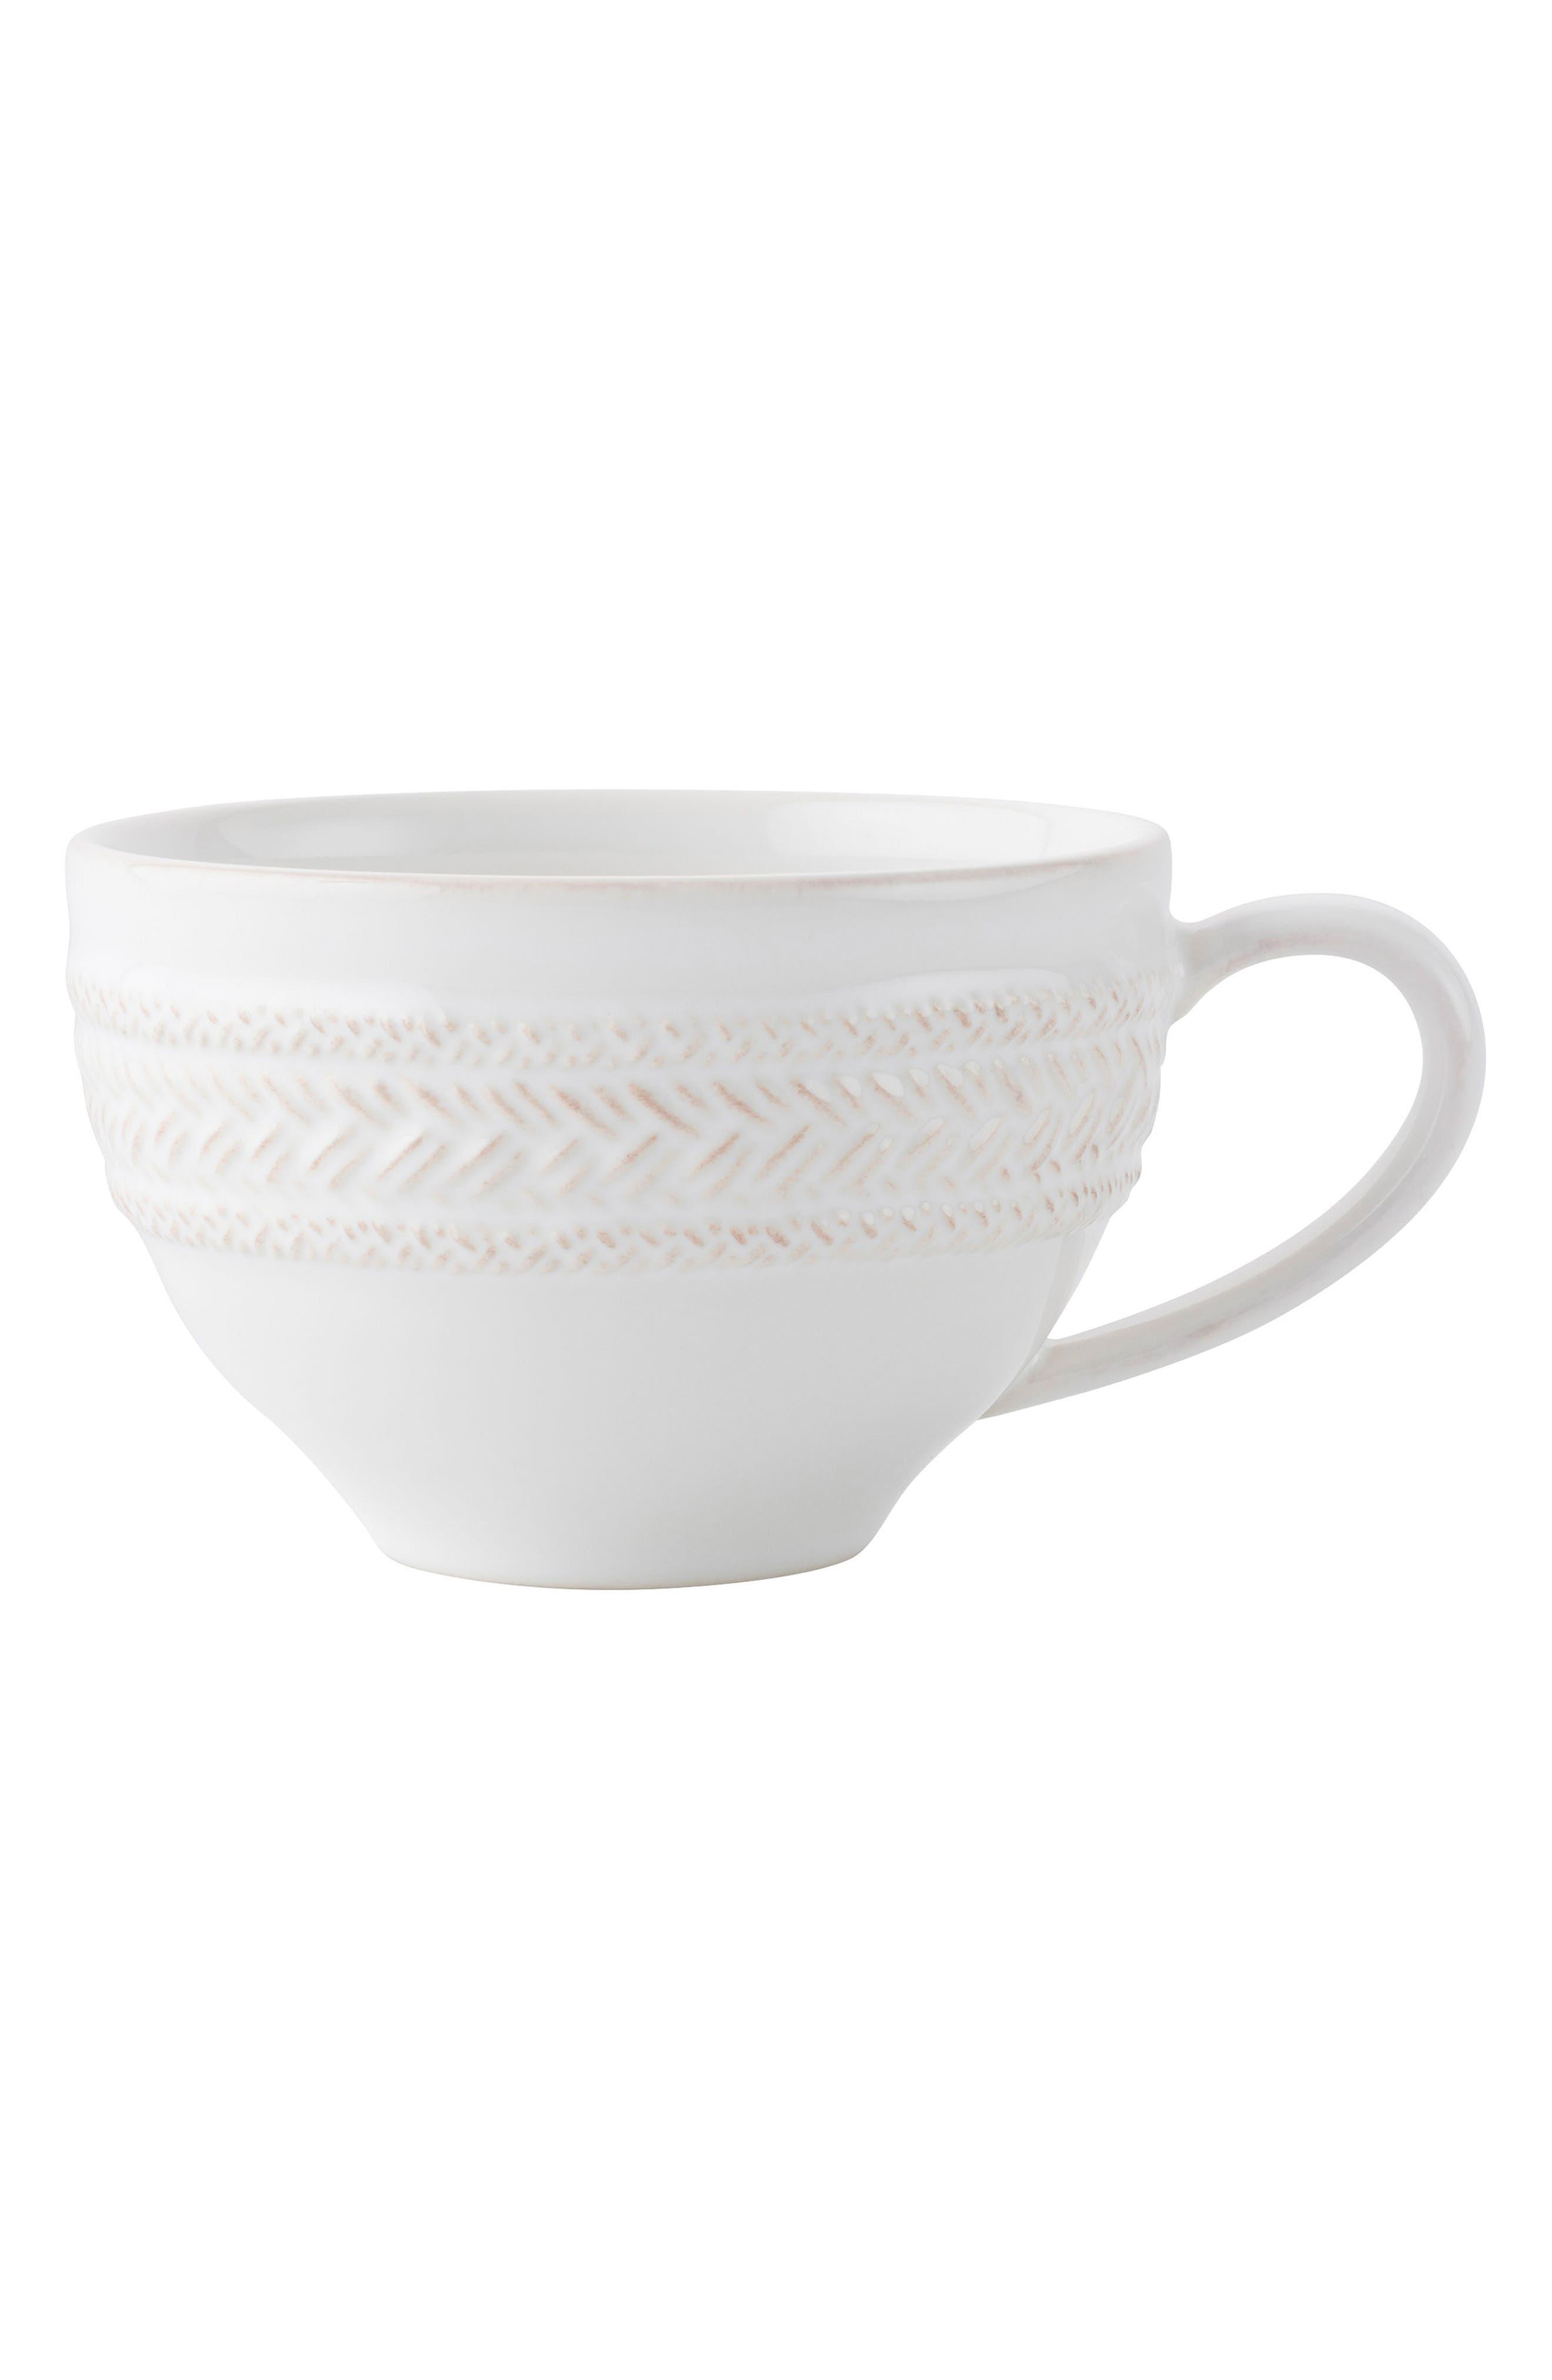 Main Image - Juliska Le Panier Whitewash Coffee Cup